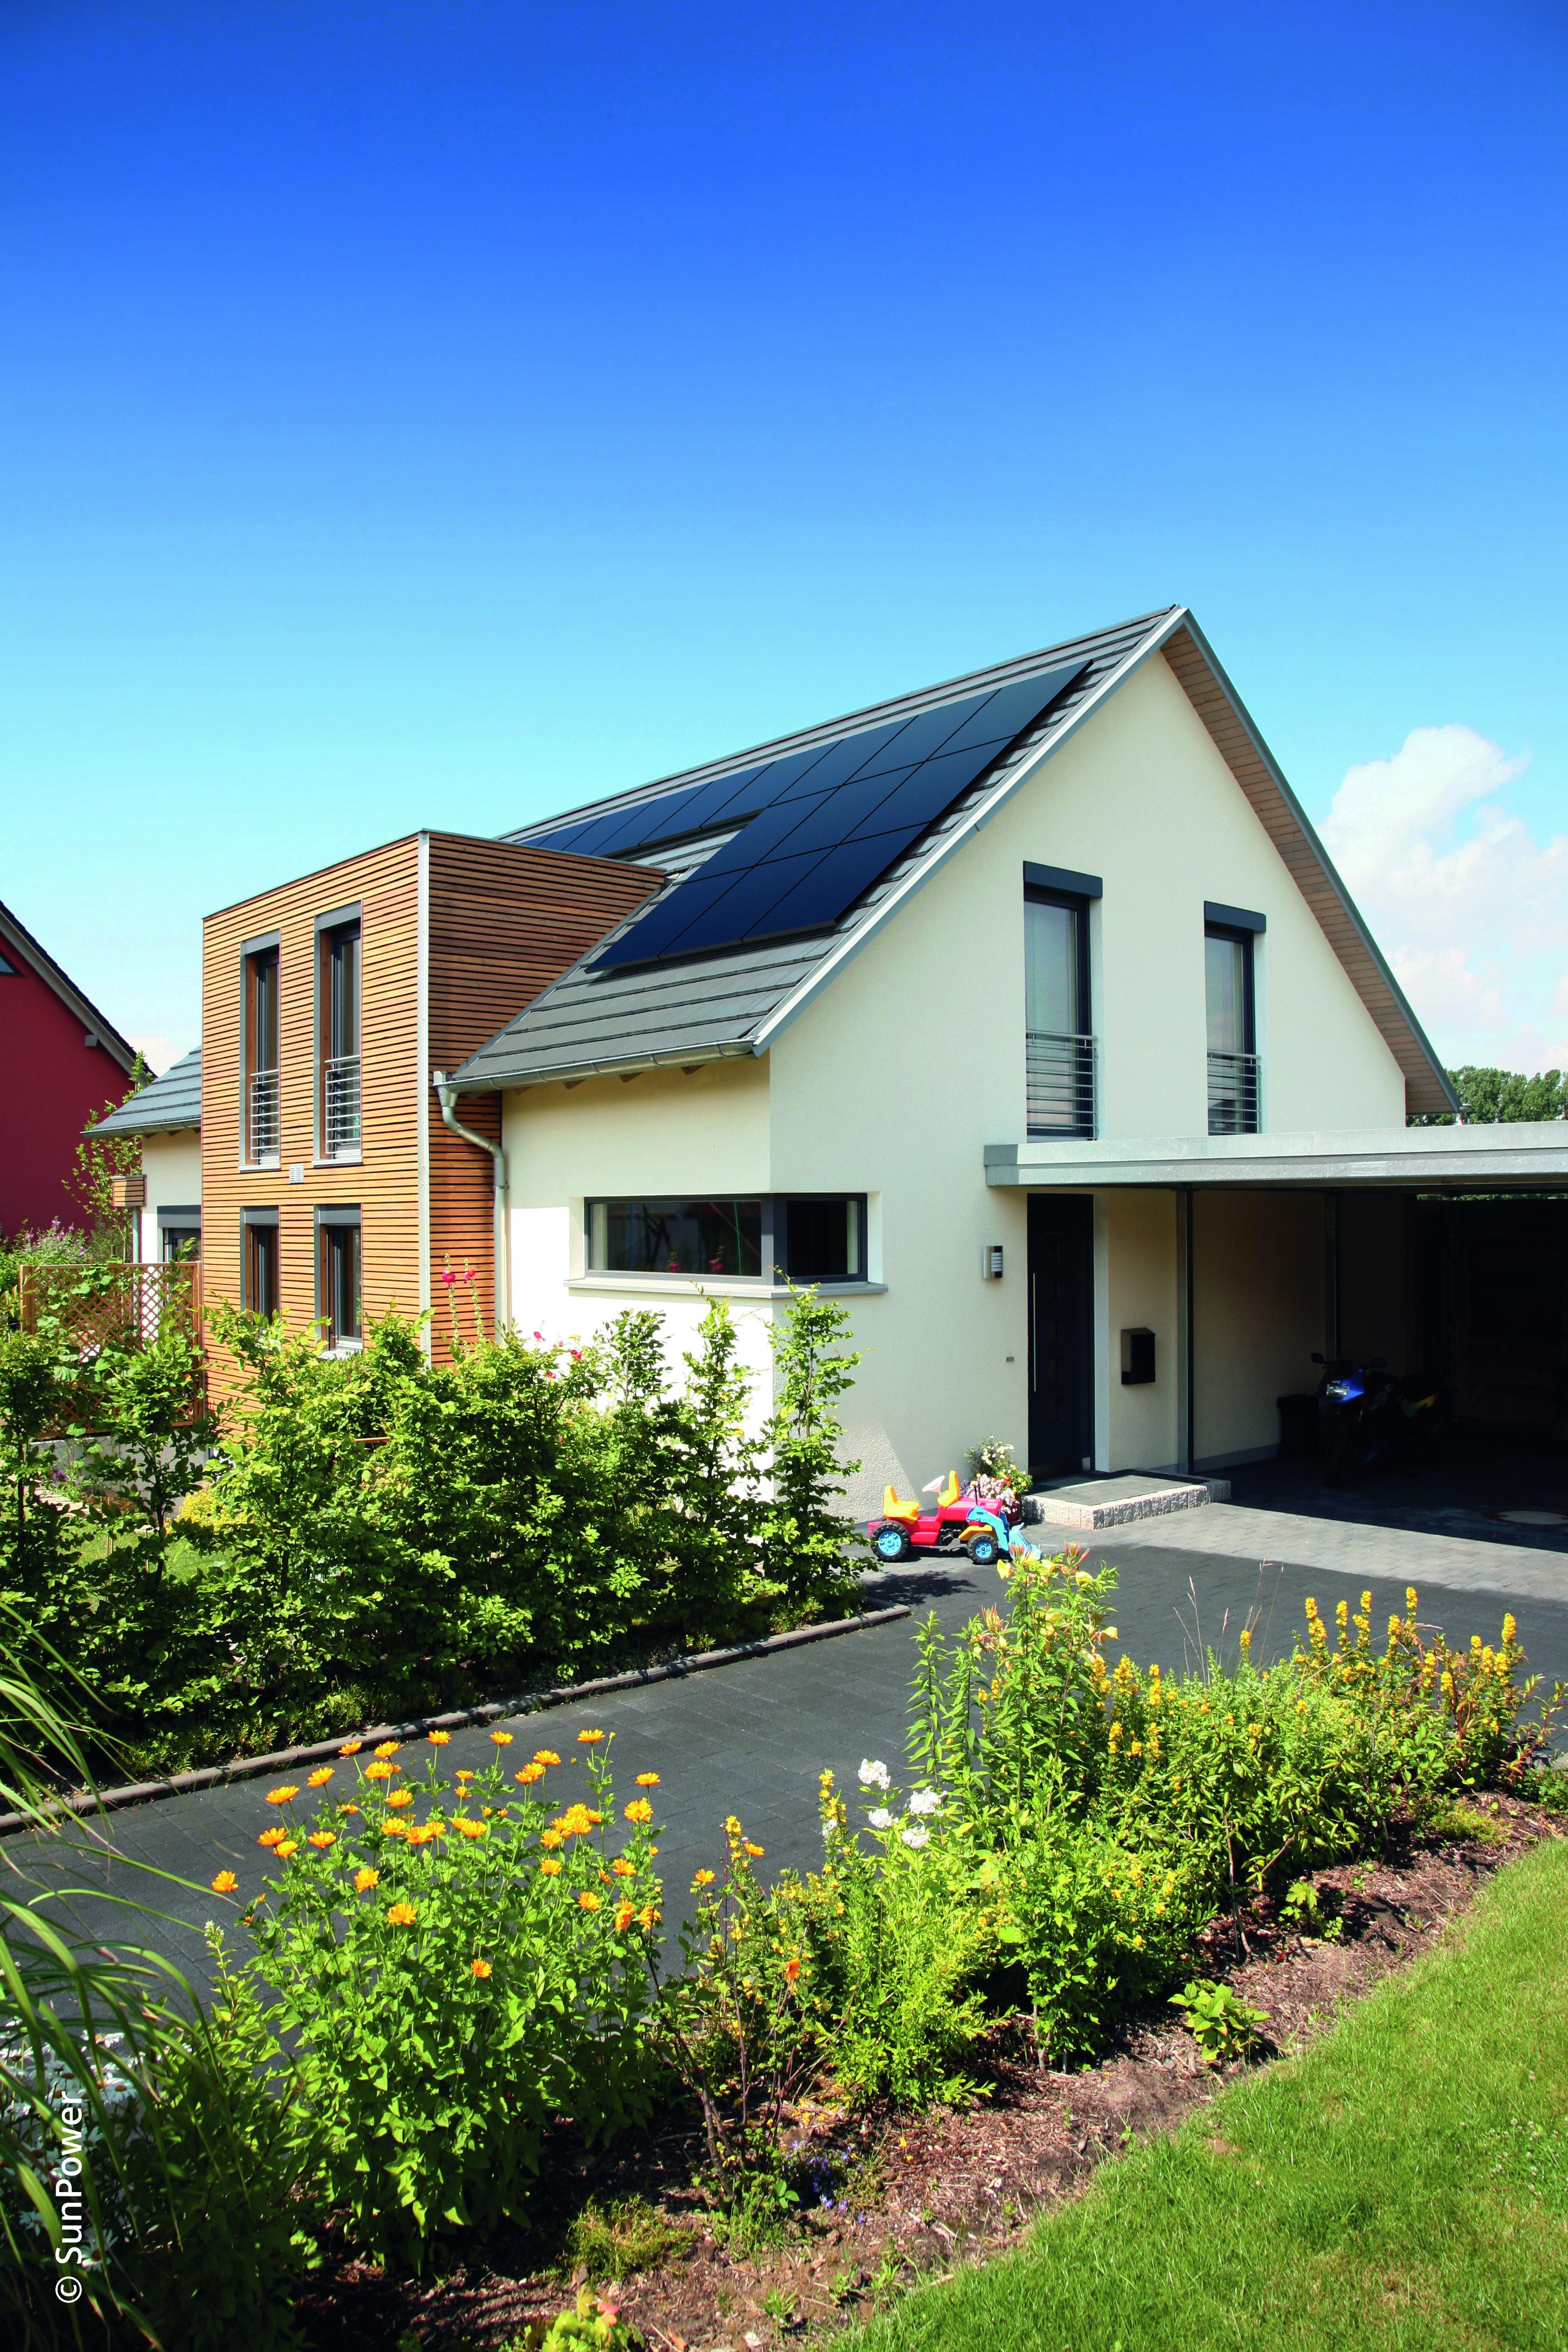 Energreen installateur photovoltaïque est Elite Partner Sunpower